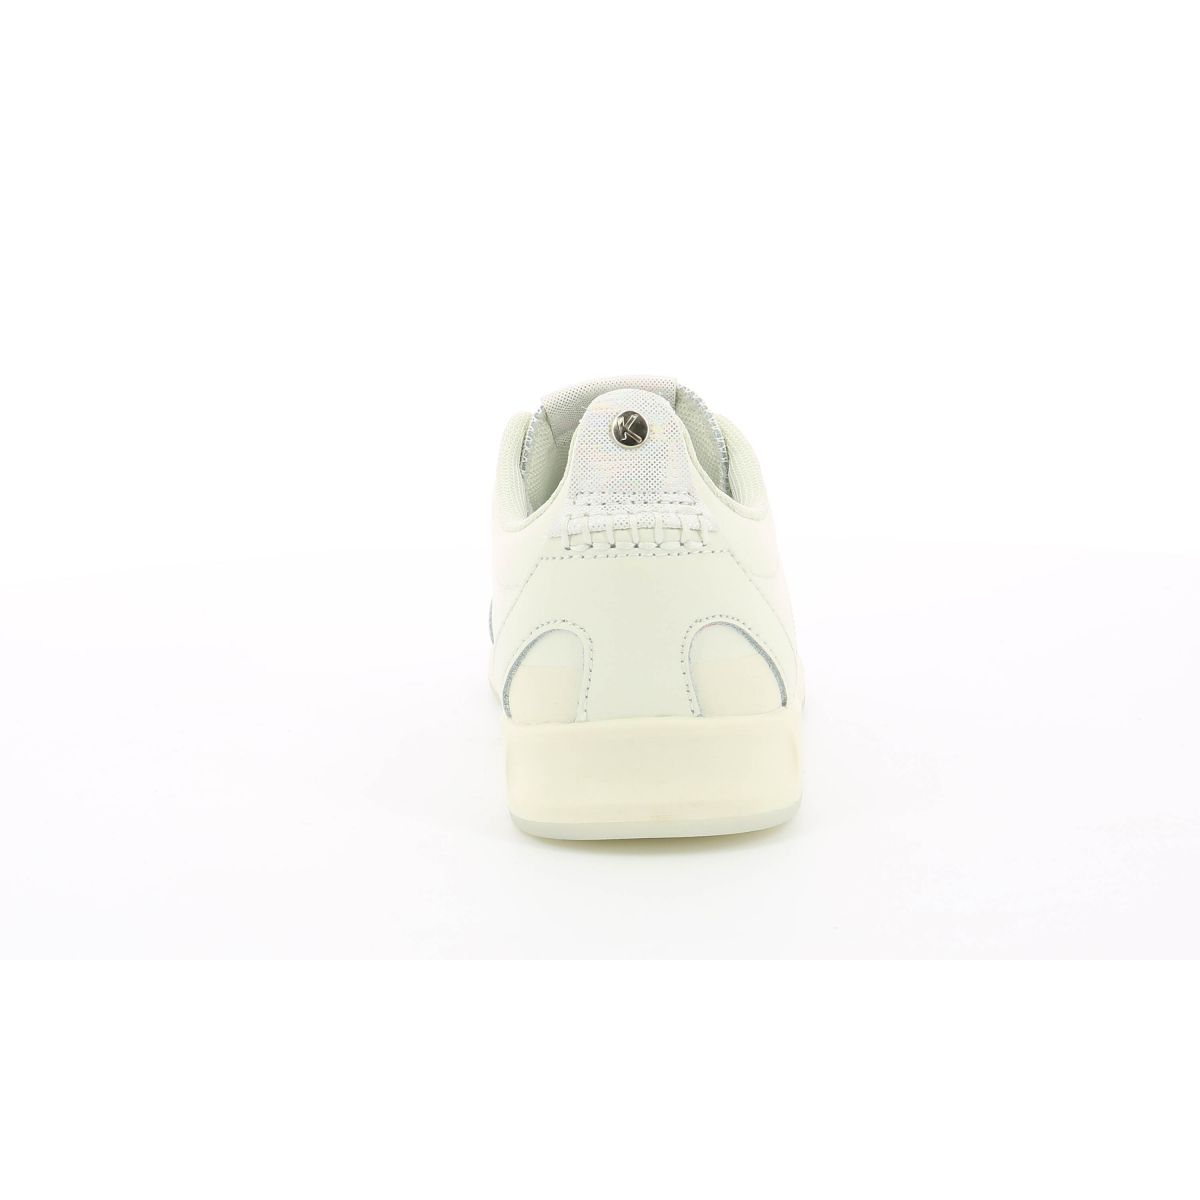 kickers Baskets femme Chaussures 2020 Online (Women) - Hit